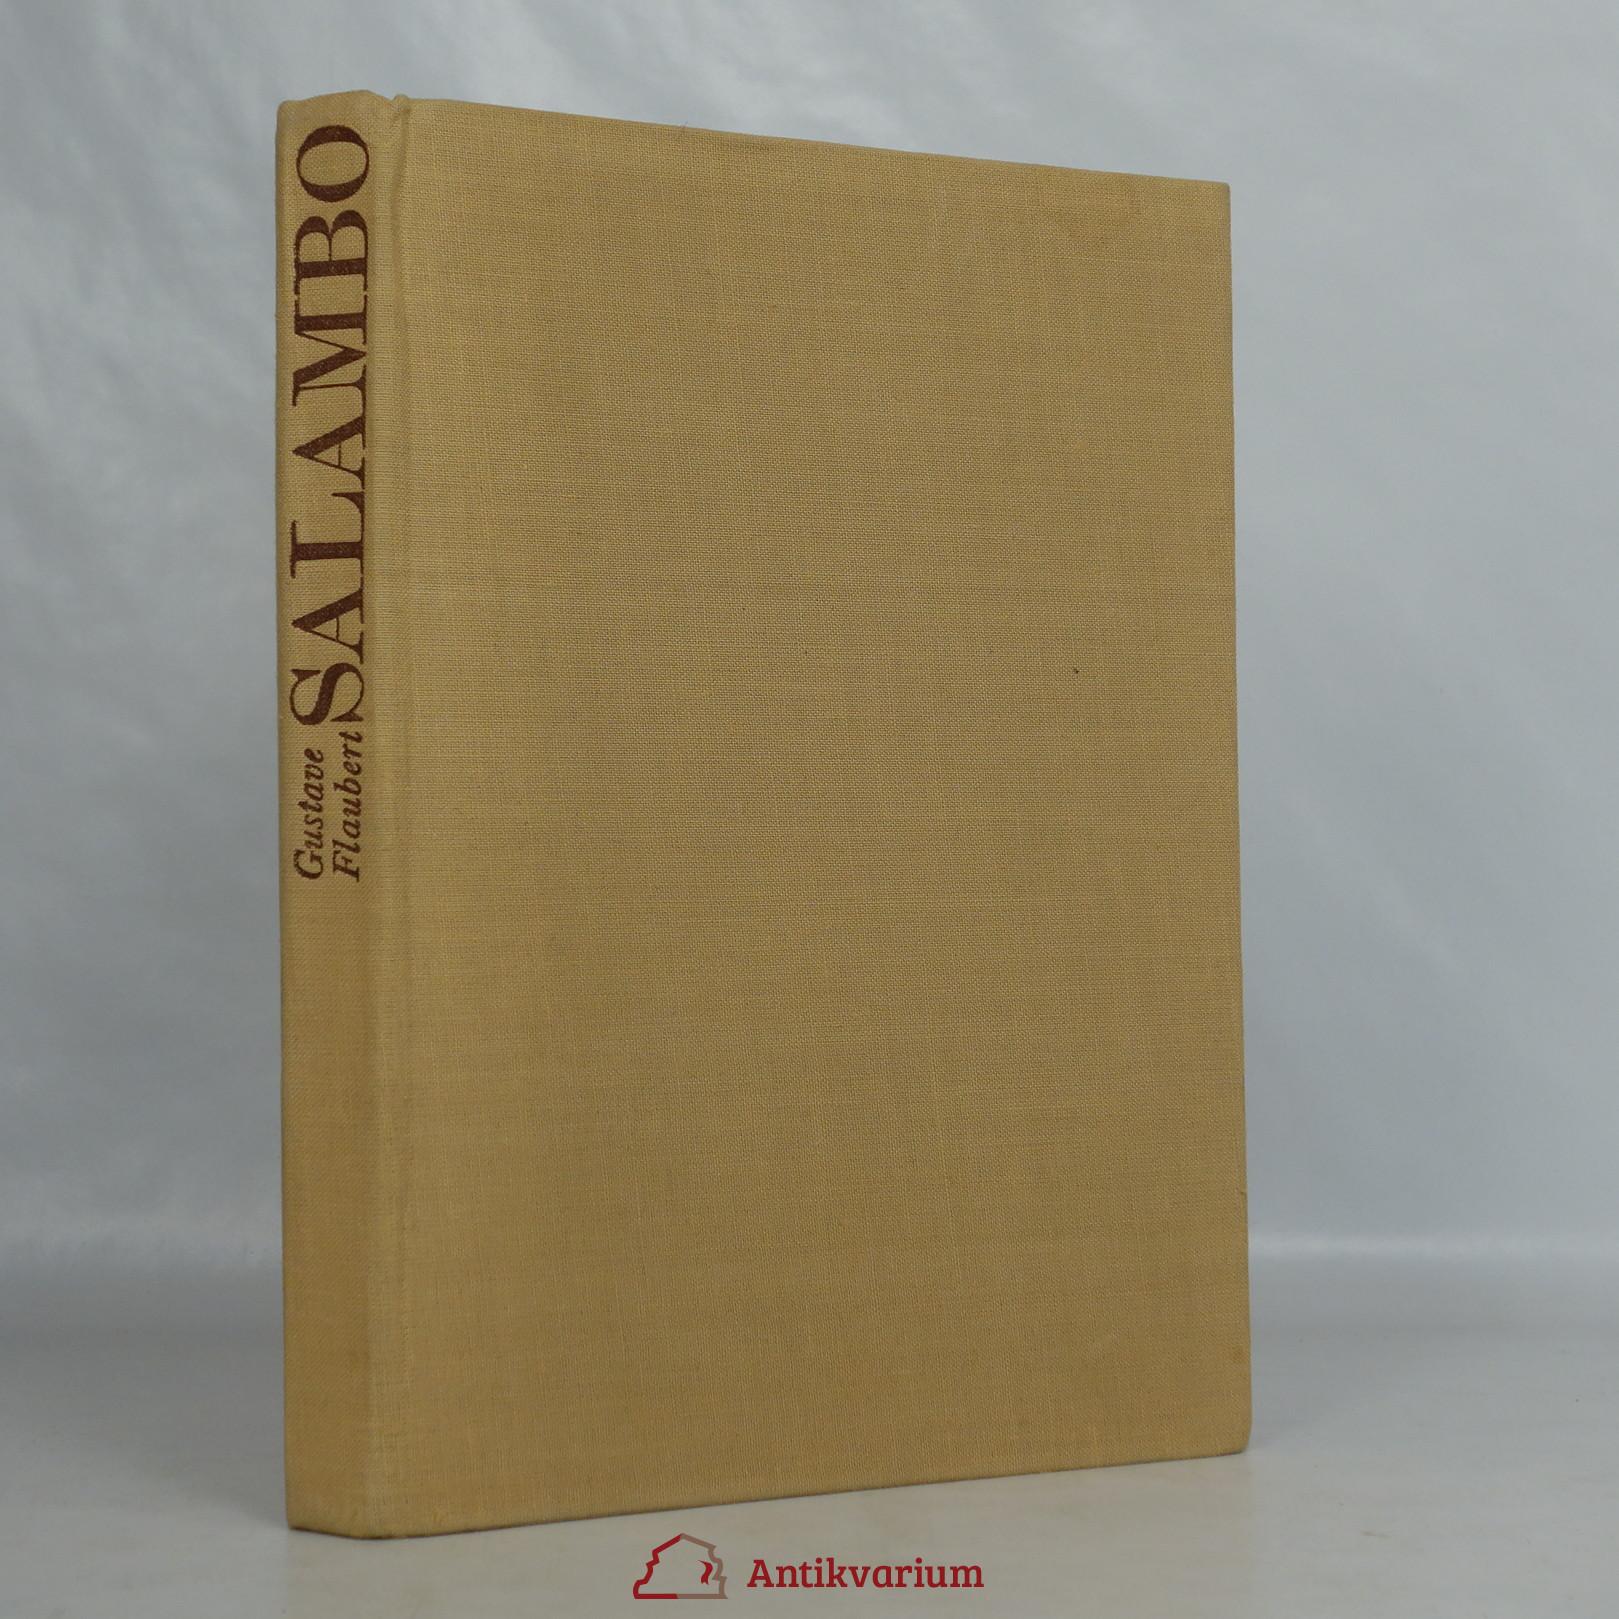 antikvární kniha Salambo, 1973